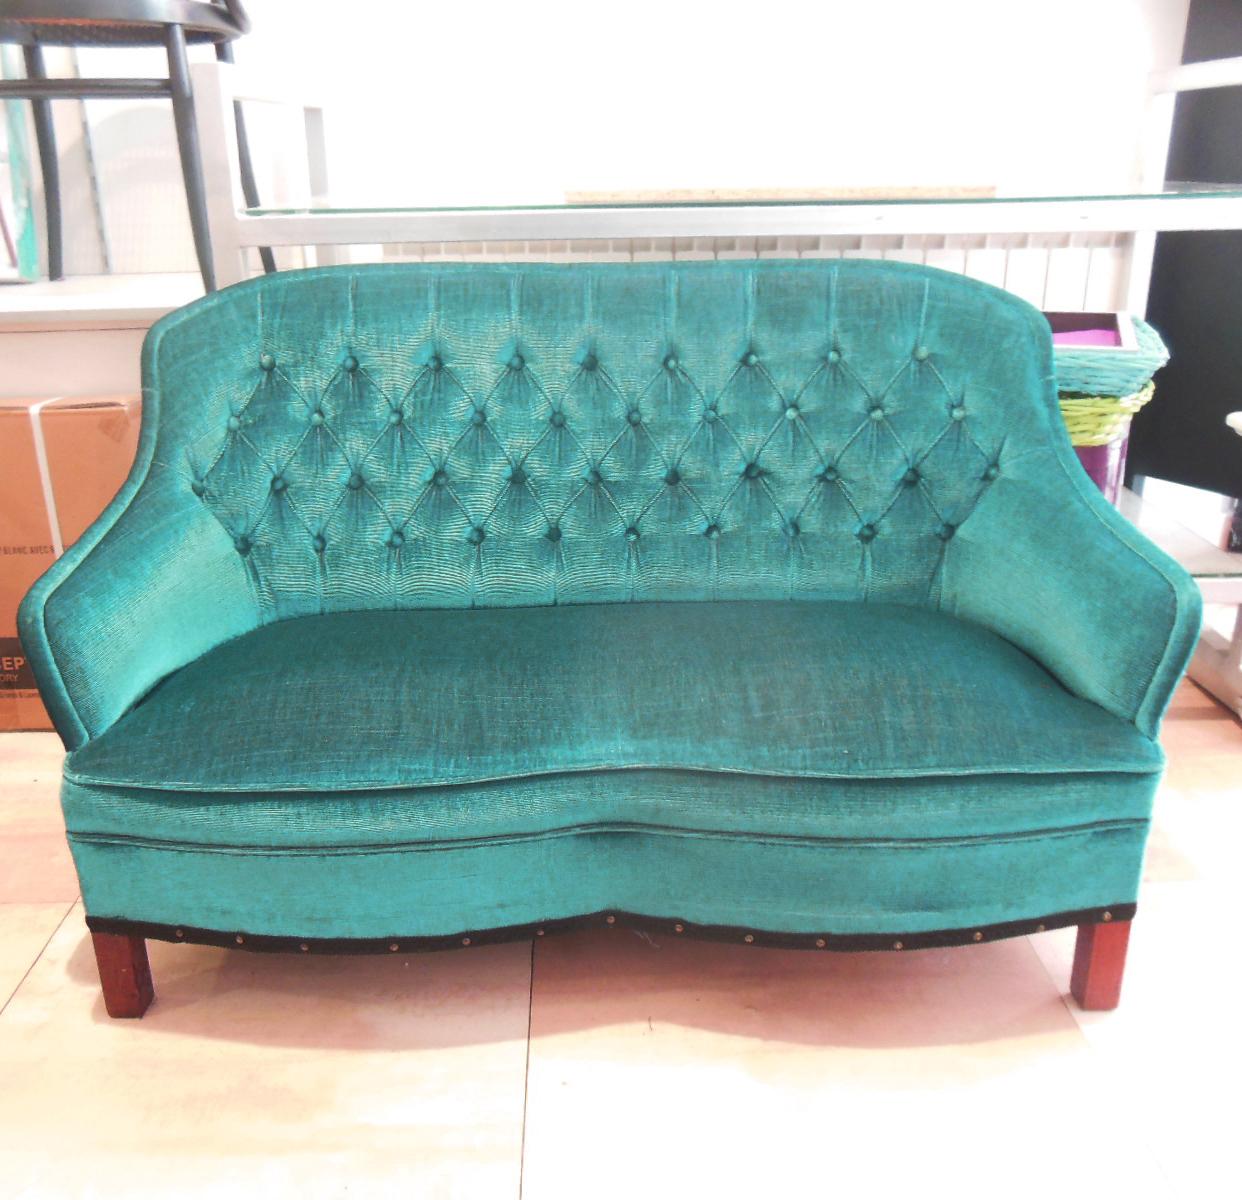 sillon vintage capitone verde azulado